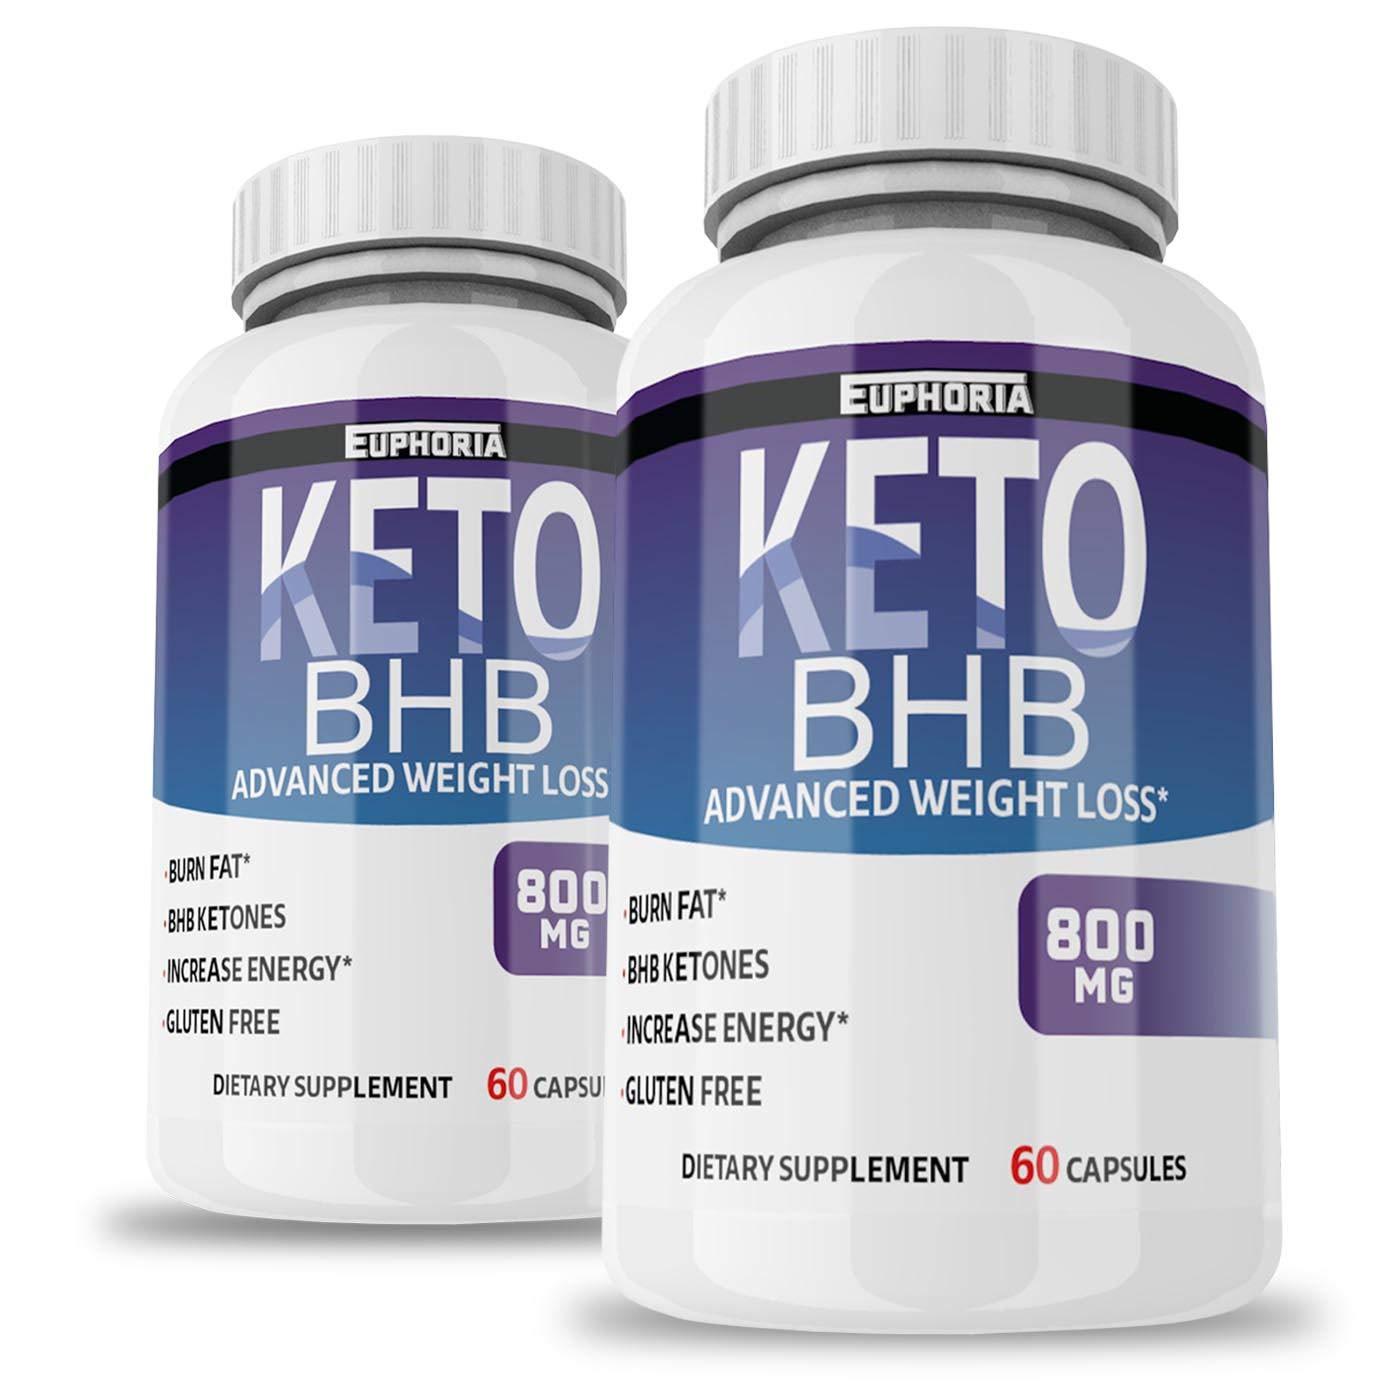 2 Pack Premium Keto Pills from Shark Tank - Best Keto BHB Pills - Weight Loss Supplement to Burn Fat - Boost Energy - Metabolism - Best Ketosis Supplement for Women and Men - Best Keto Diet